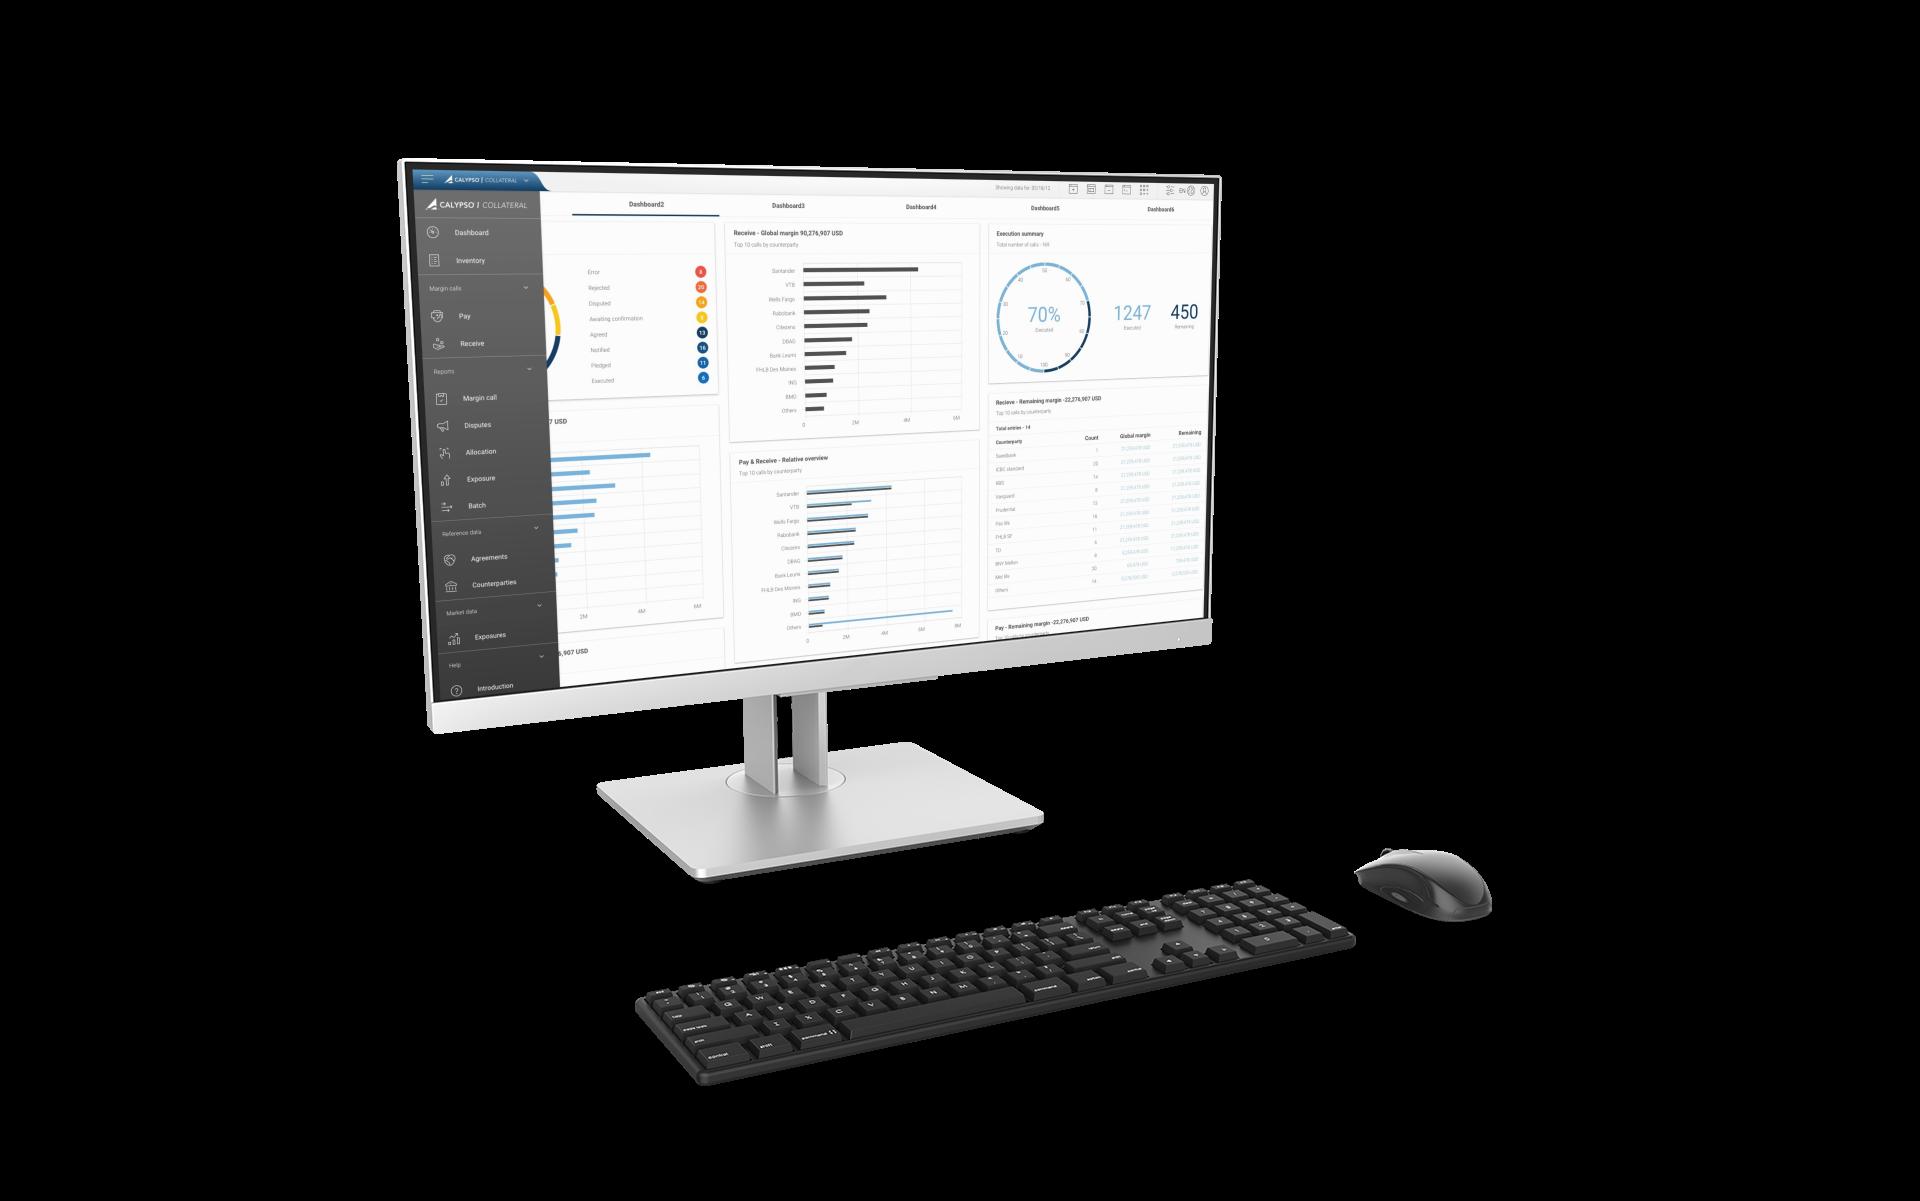 Calypso_desktop-pc-mockup-in-a-minimalistic-solid-color-background-26135-3